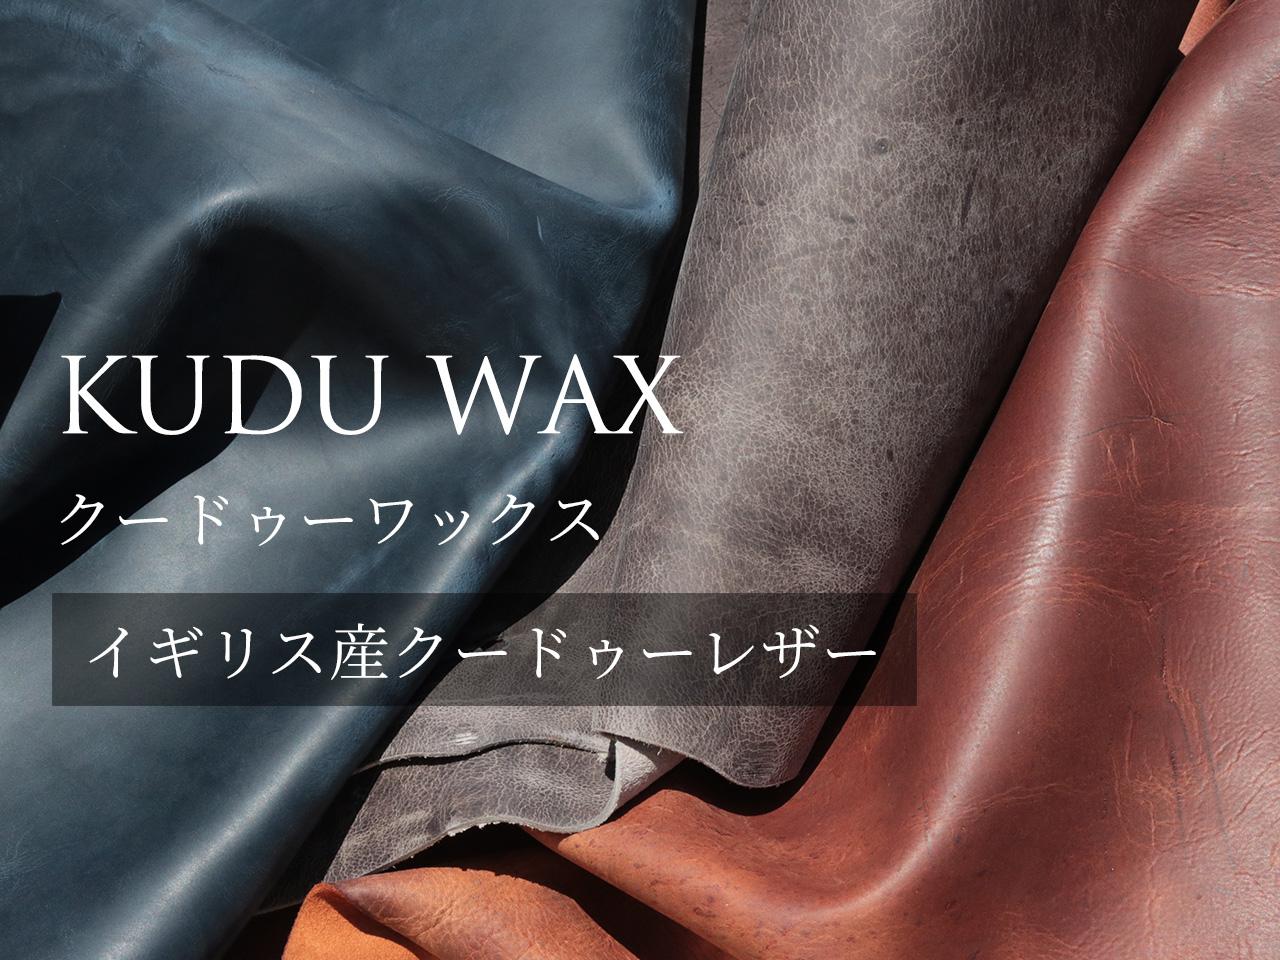 KUDU WAX(クードゥーワックス)について